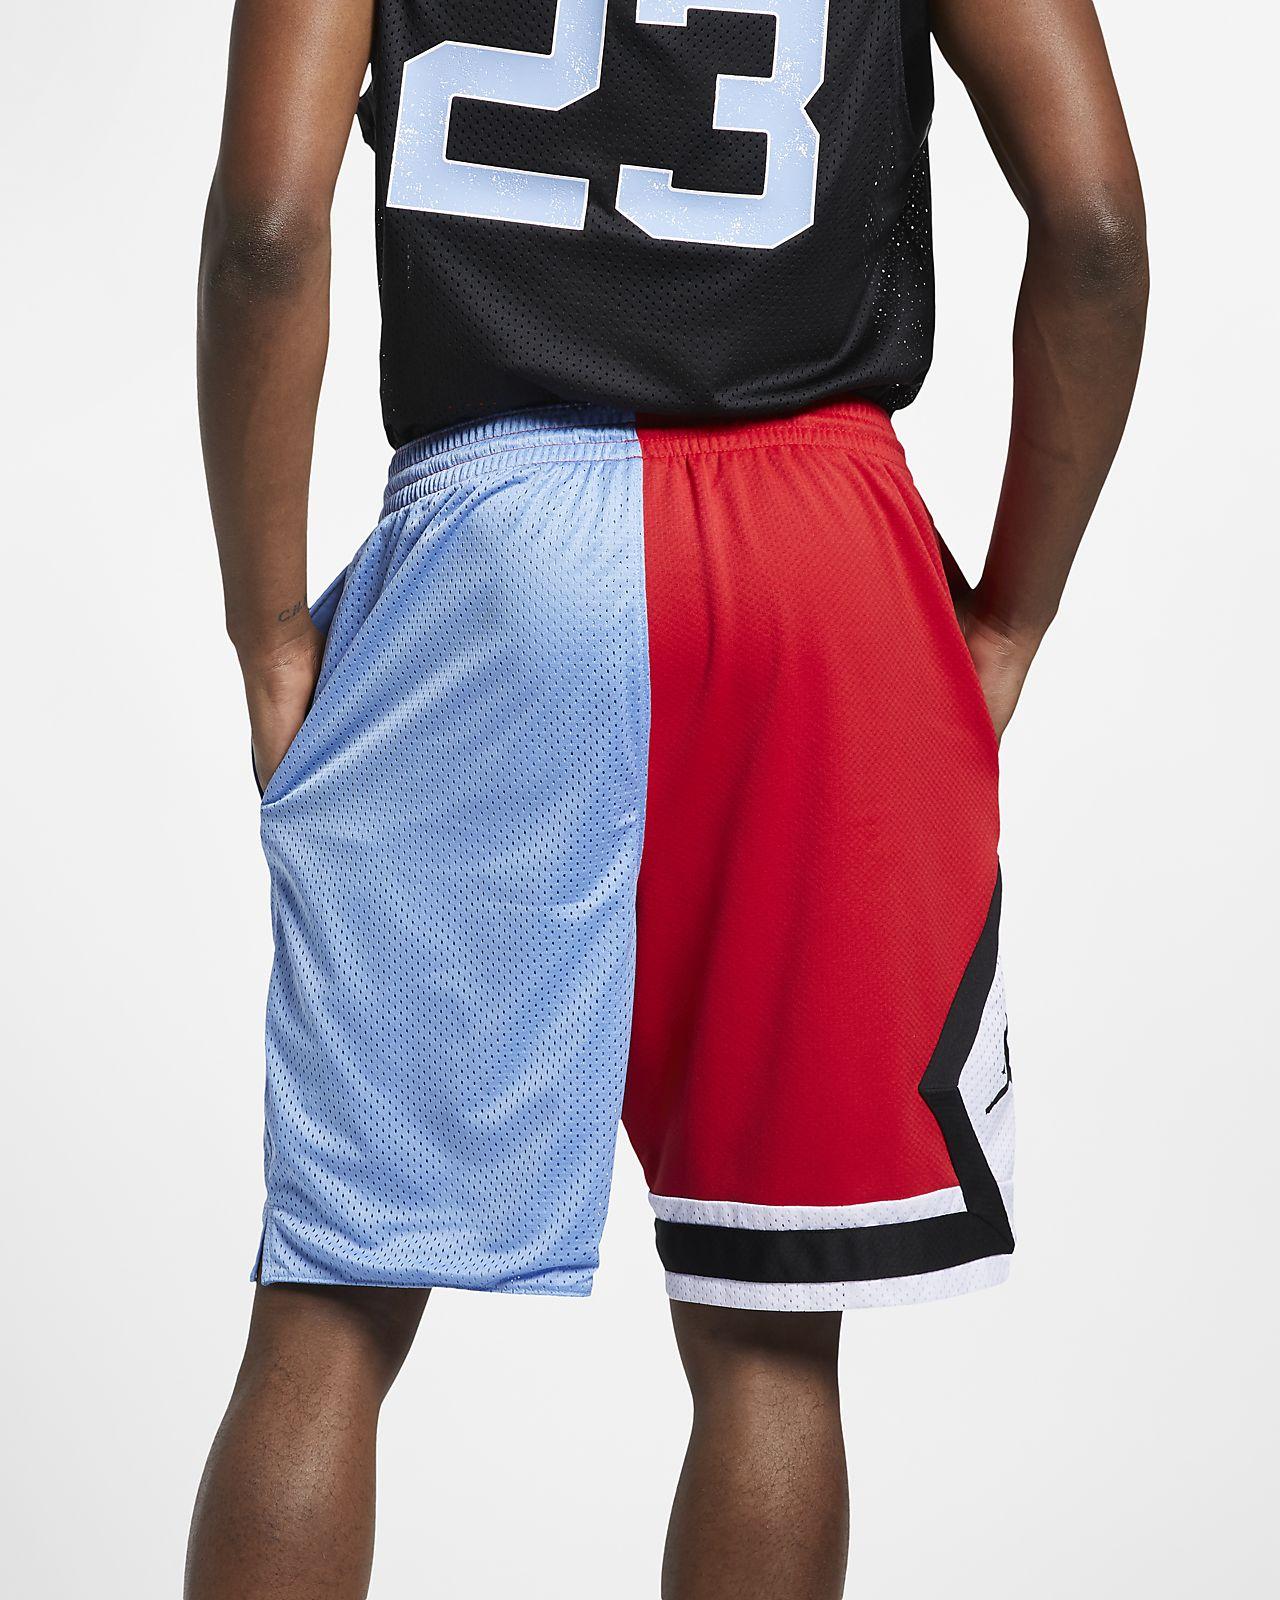 4d7da9960b0 Jordan DNA Distorted Men's Basketball Shorts. Nike.com